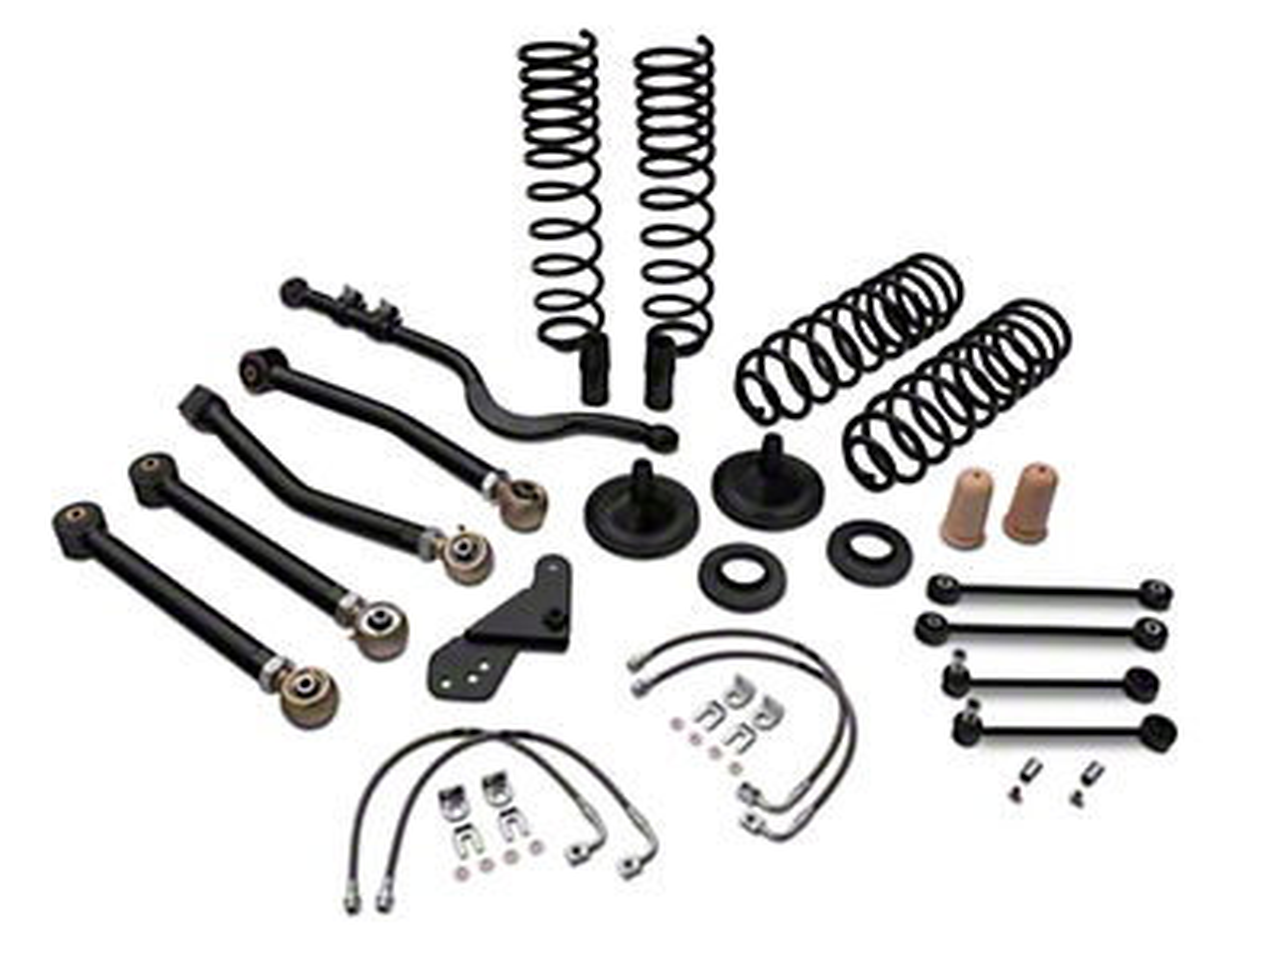 Tuff Country 4 in. EZ-Flex Lift Kit w/o Shocks (07-18 Jeep Wrangler JK 4 Door)